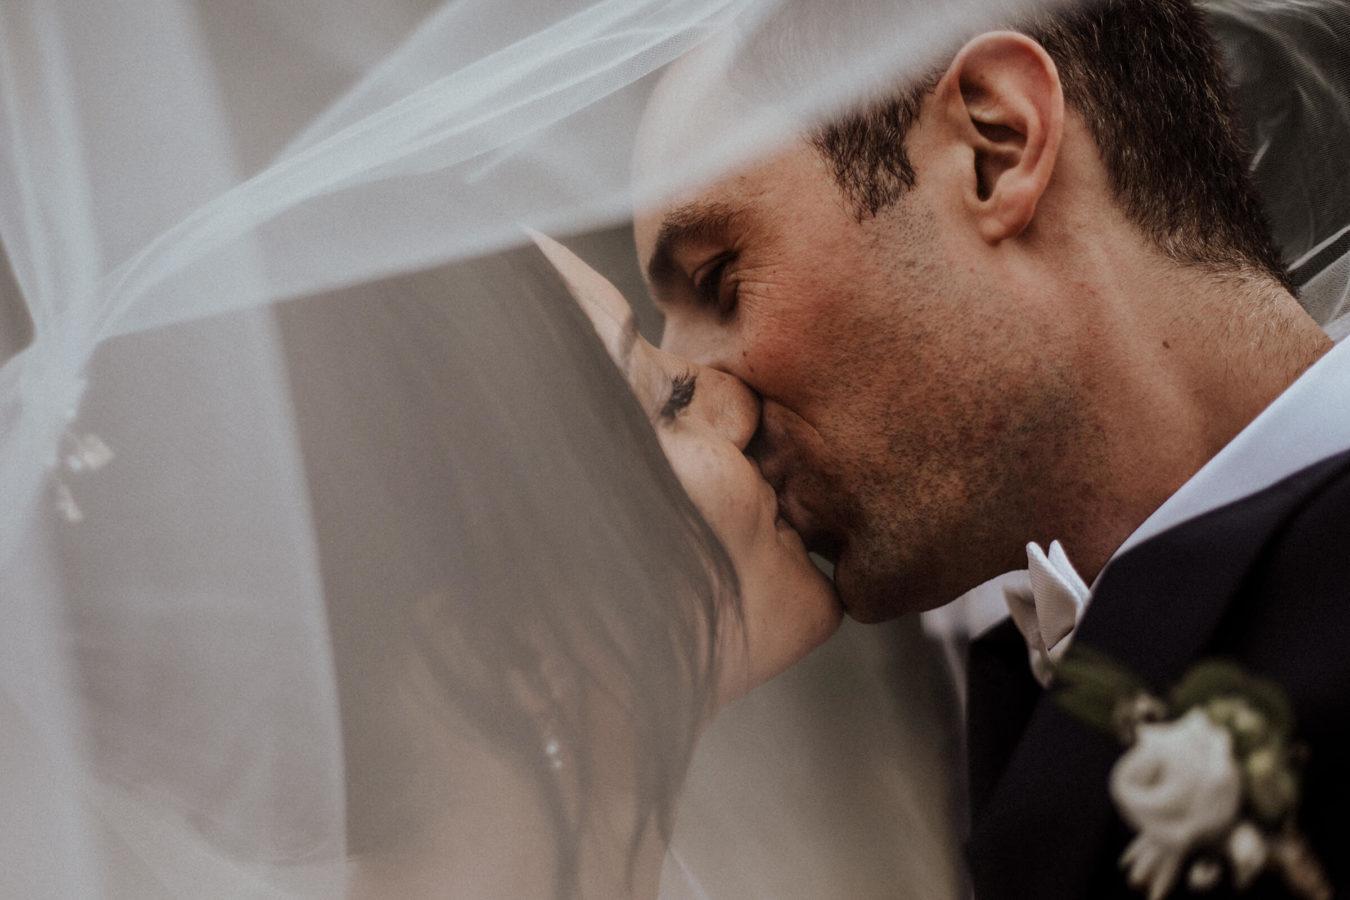 photographe mariage couple Orléans Loiret France